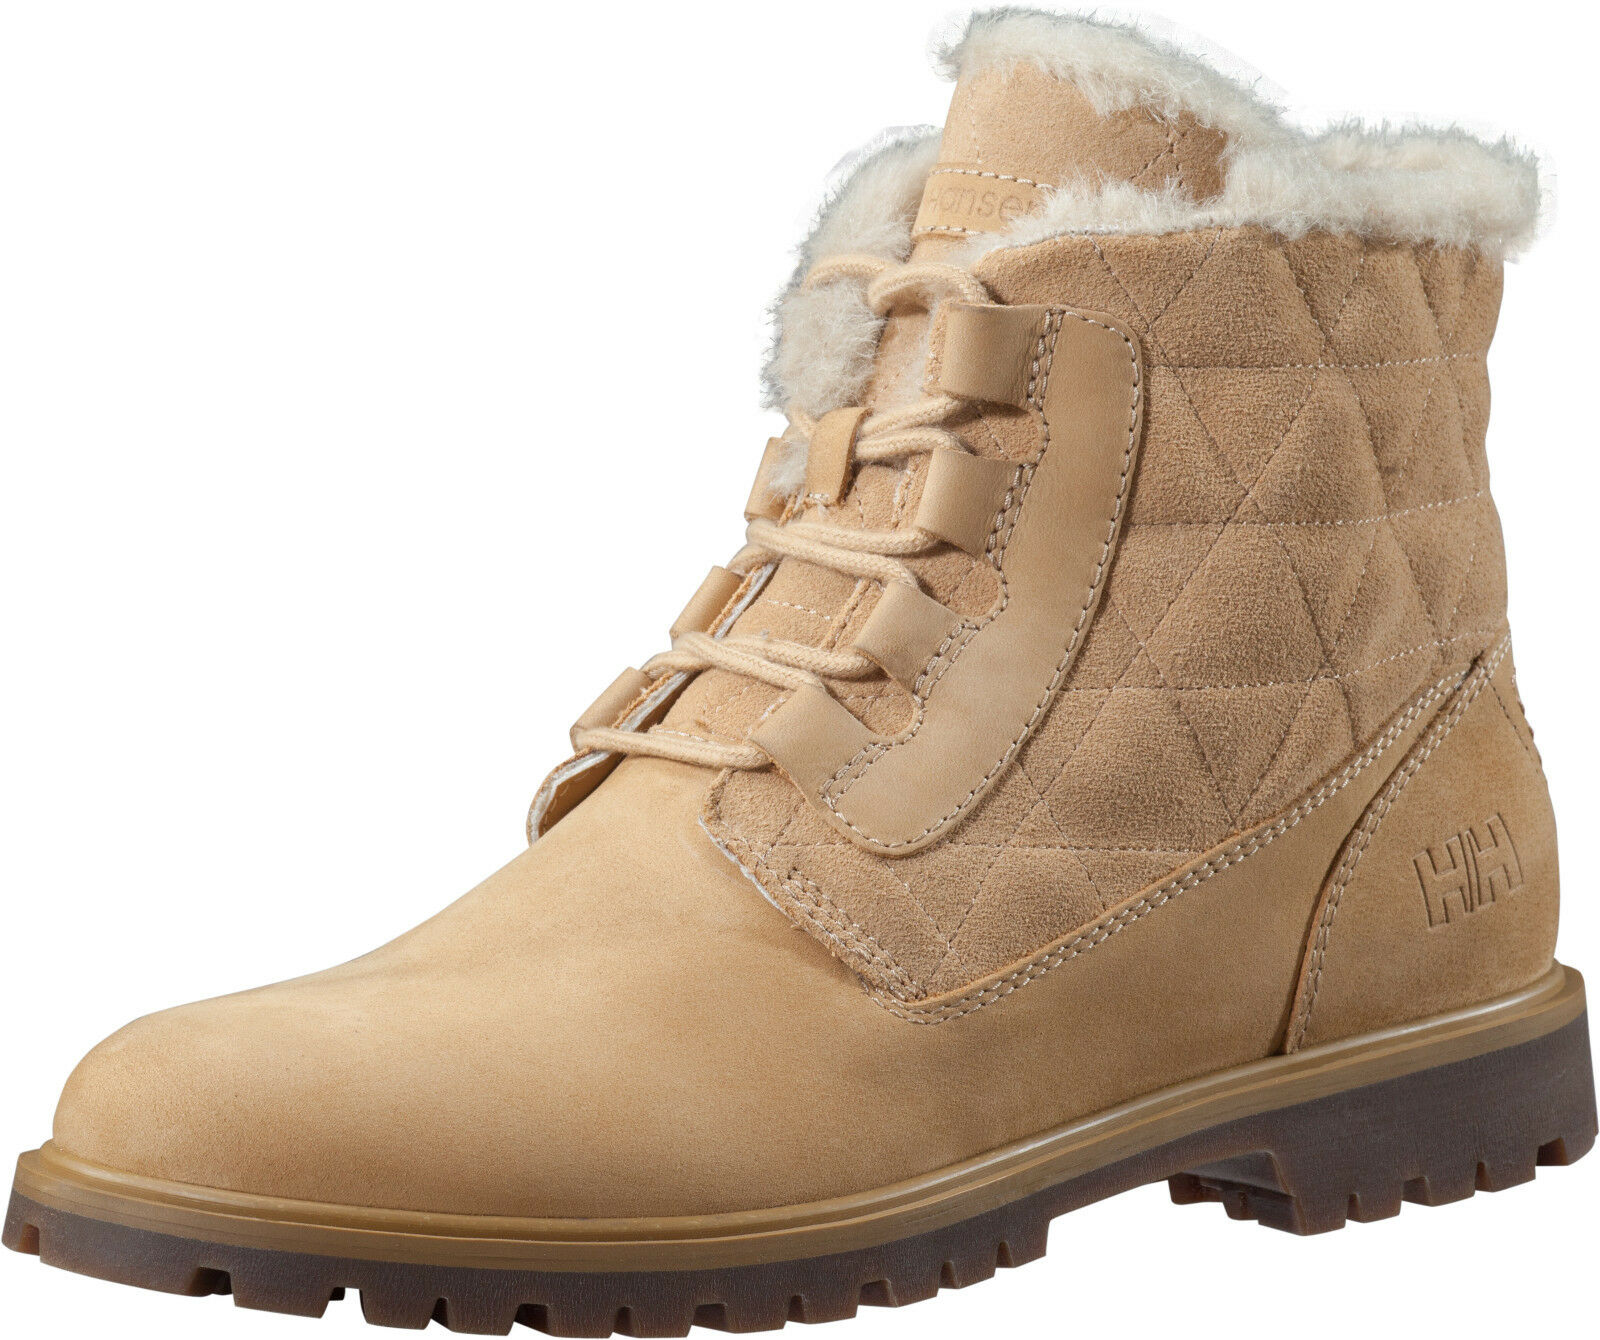 Helly Hansen W Vega Boot 10886/704 Camel/Natura/Shitake Camel/Natura/Shitake 10886/704 NEW b40622